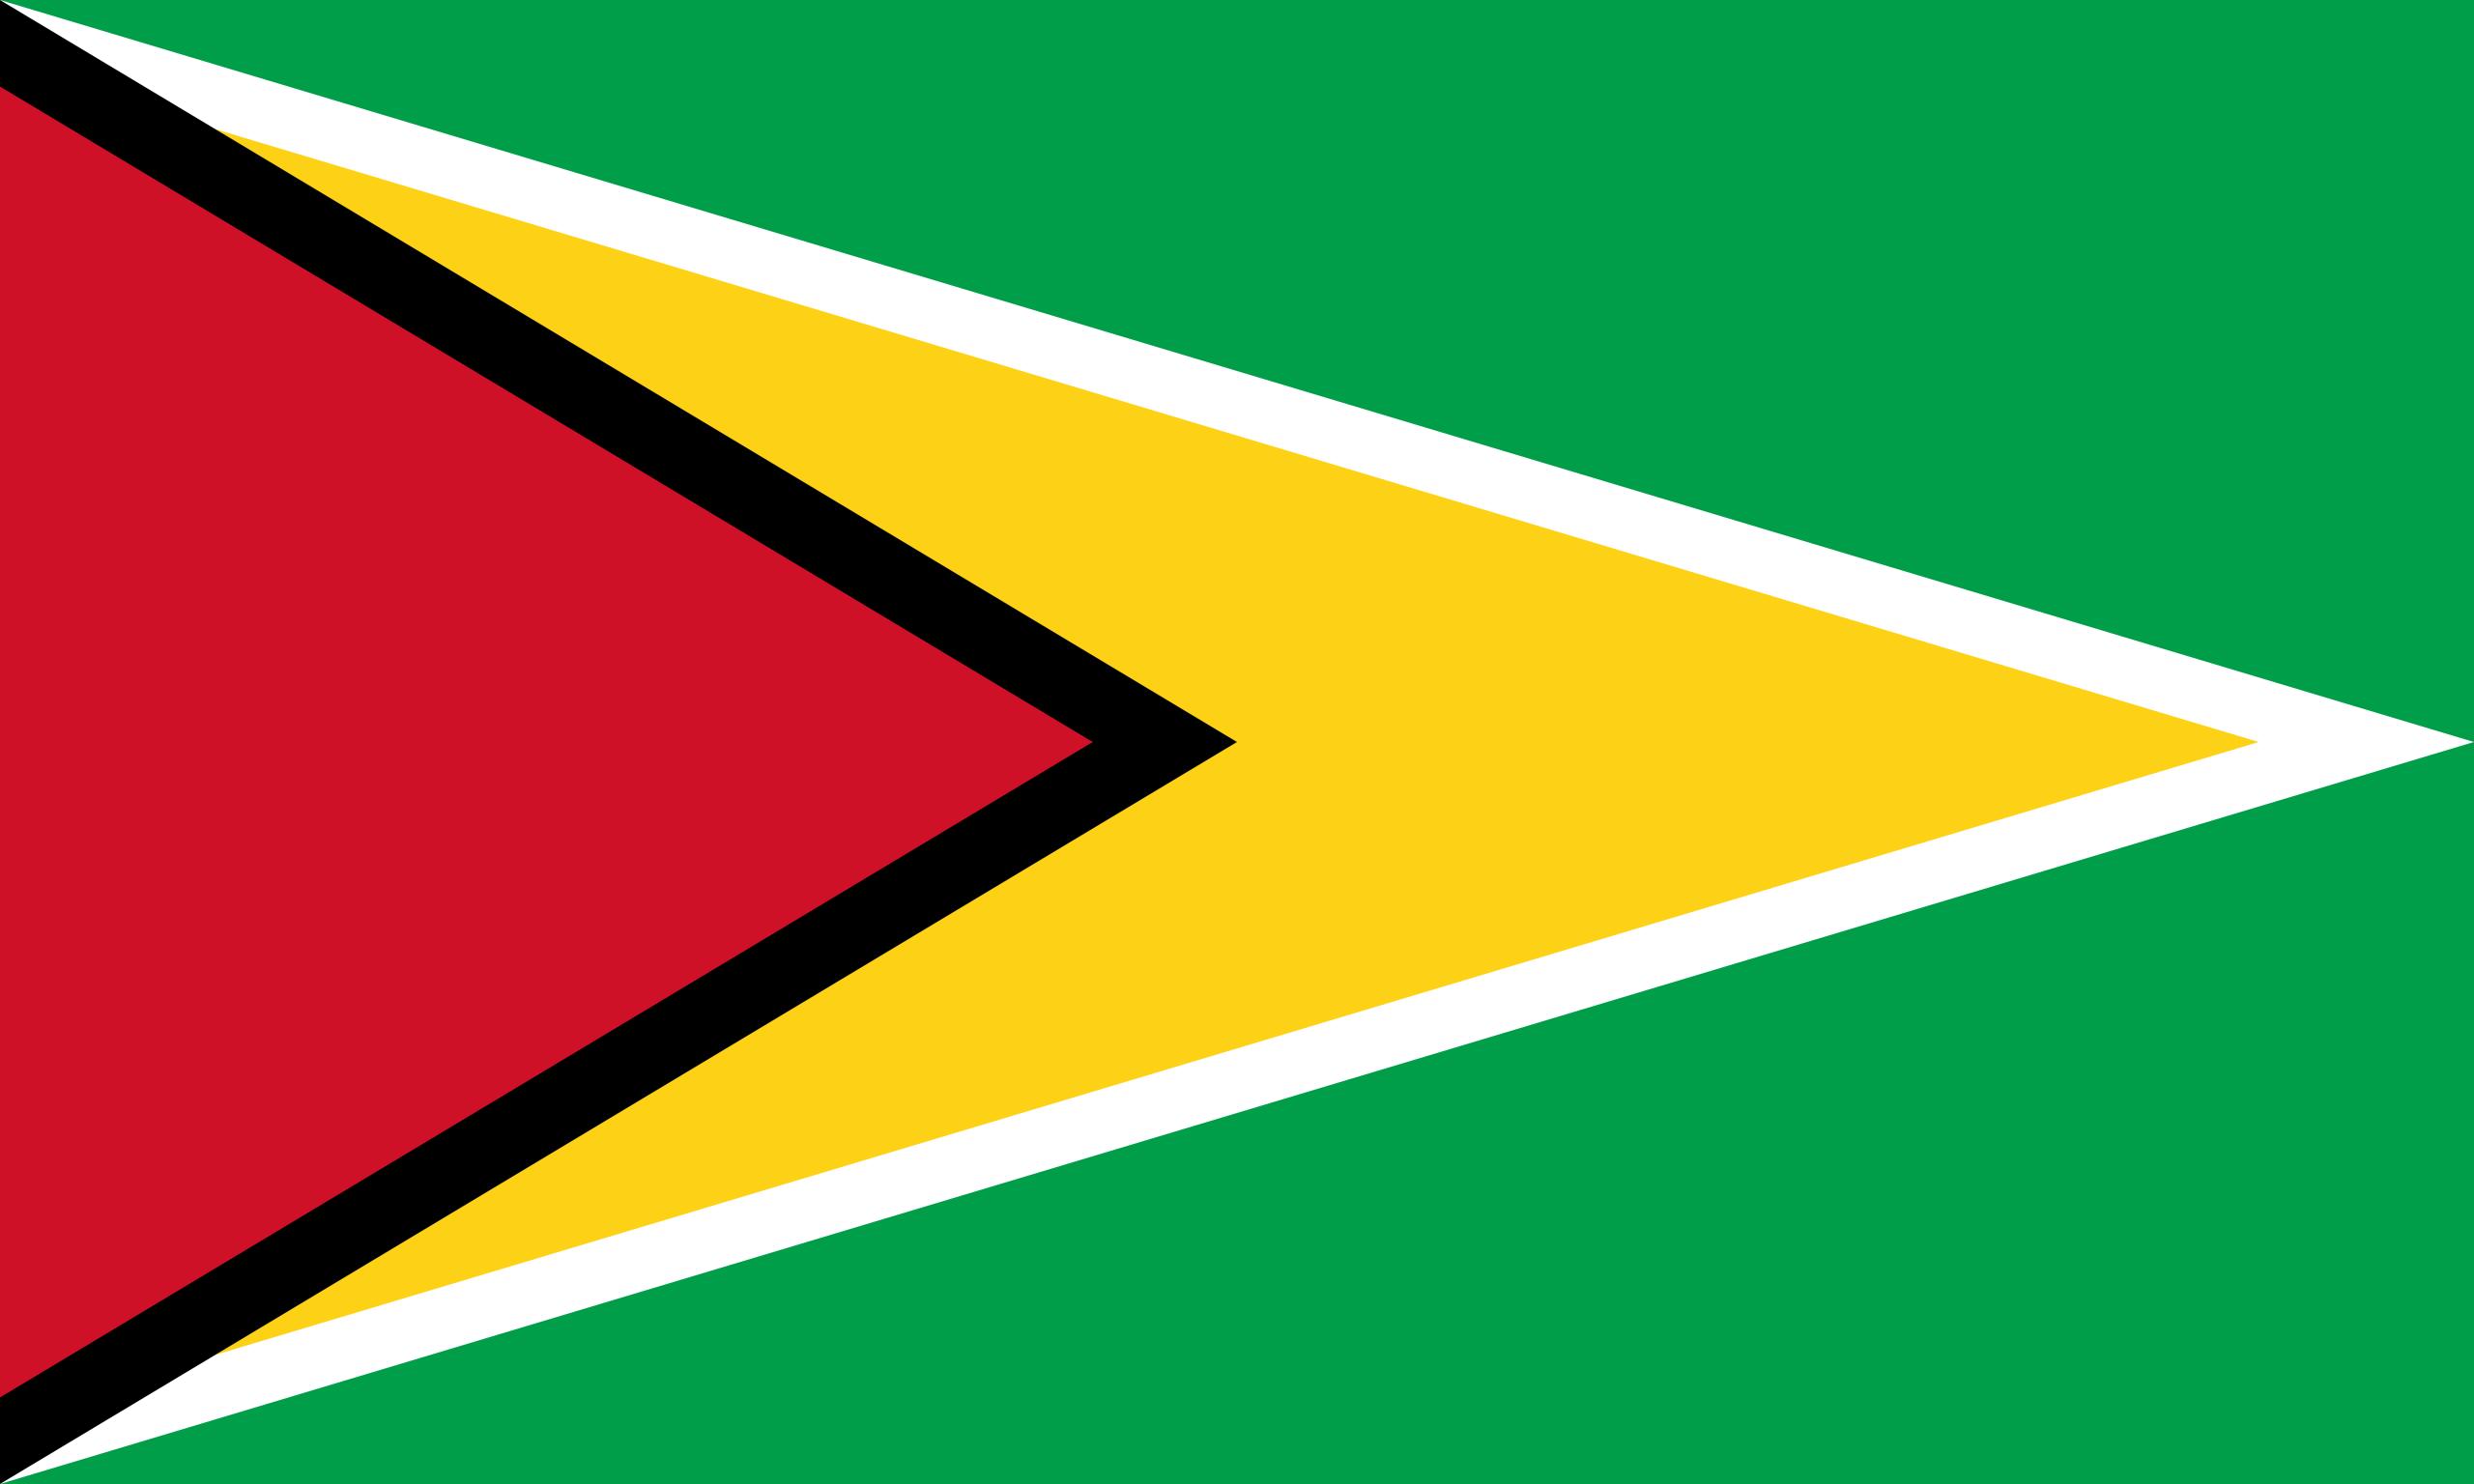 गुयाना, देश, emblema, लोग�प्रतीकbolo - HD वॉलपेपर - प्रोफेसर-falken.com